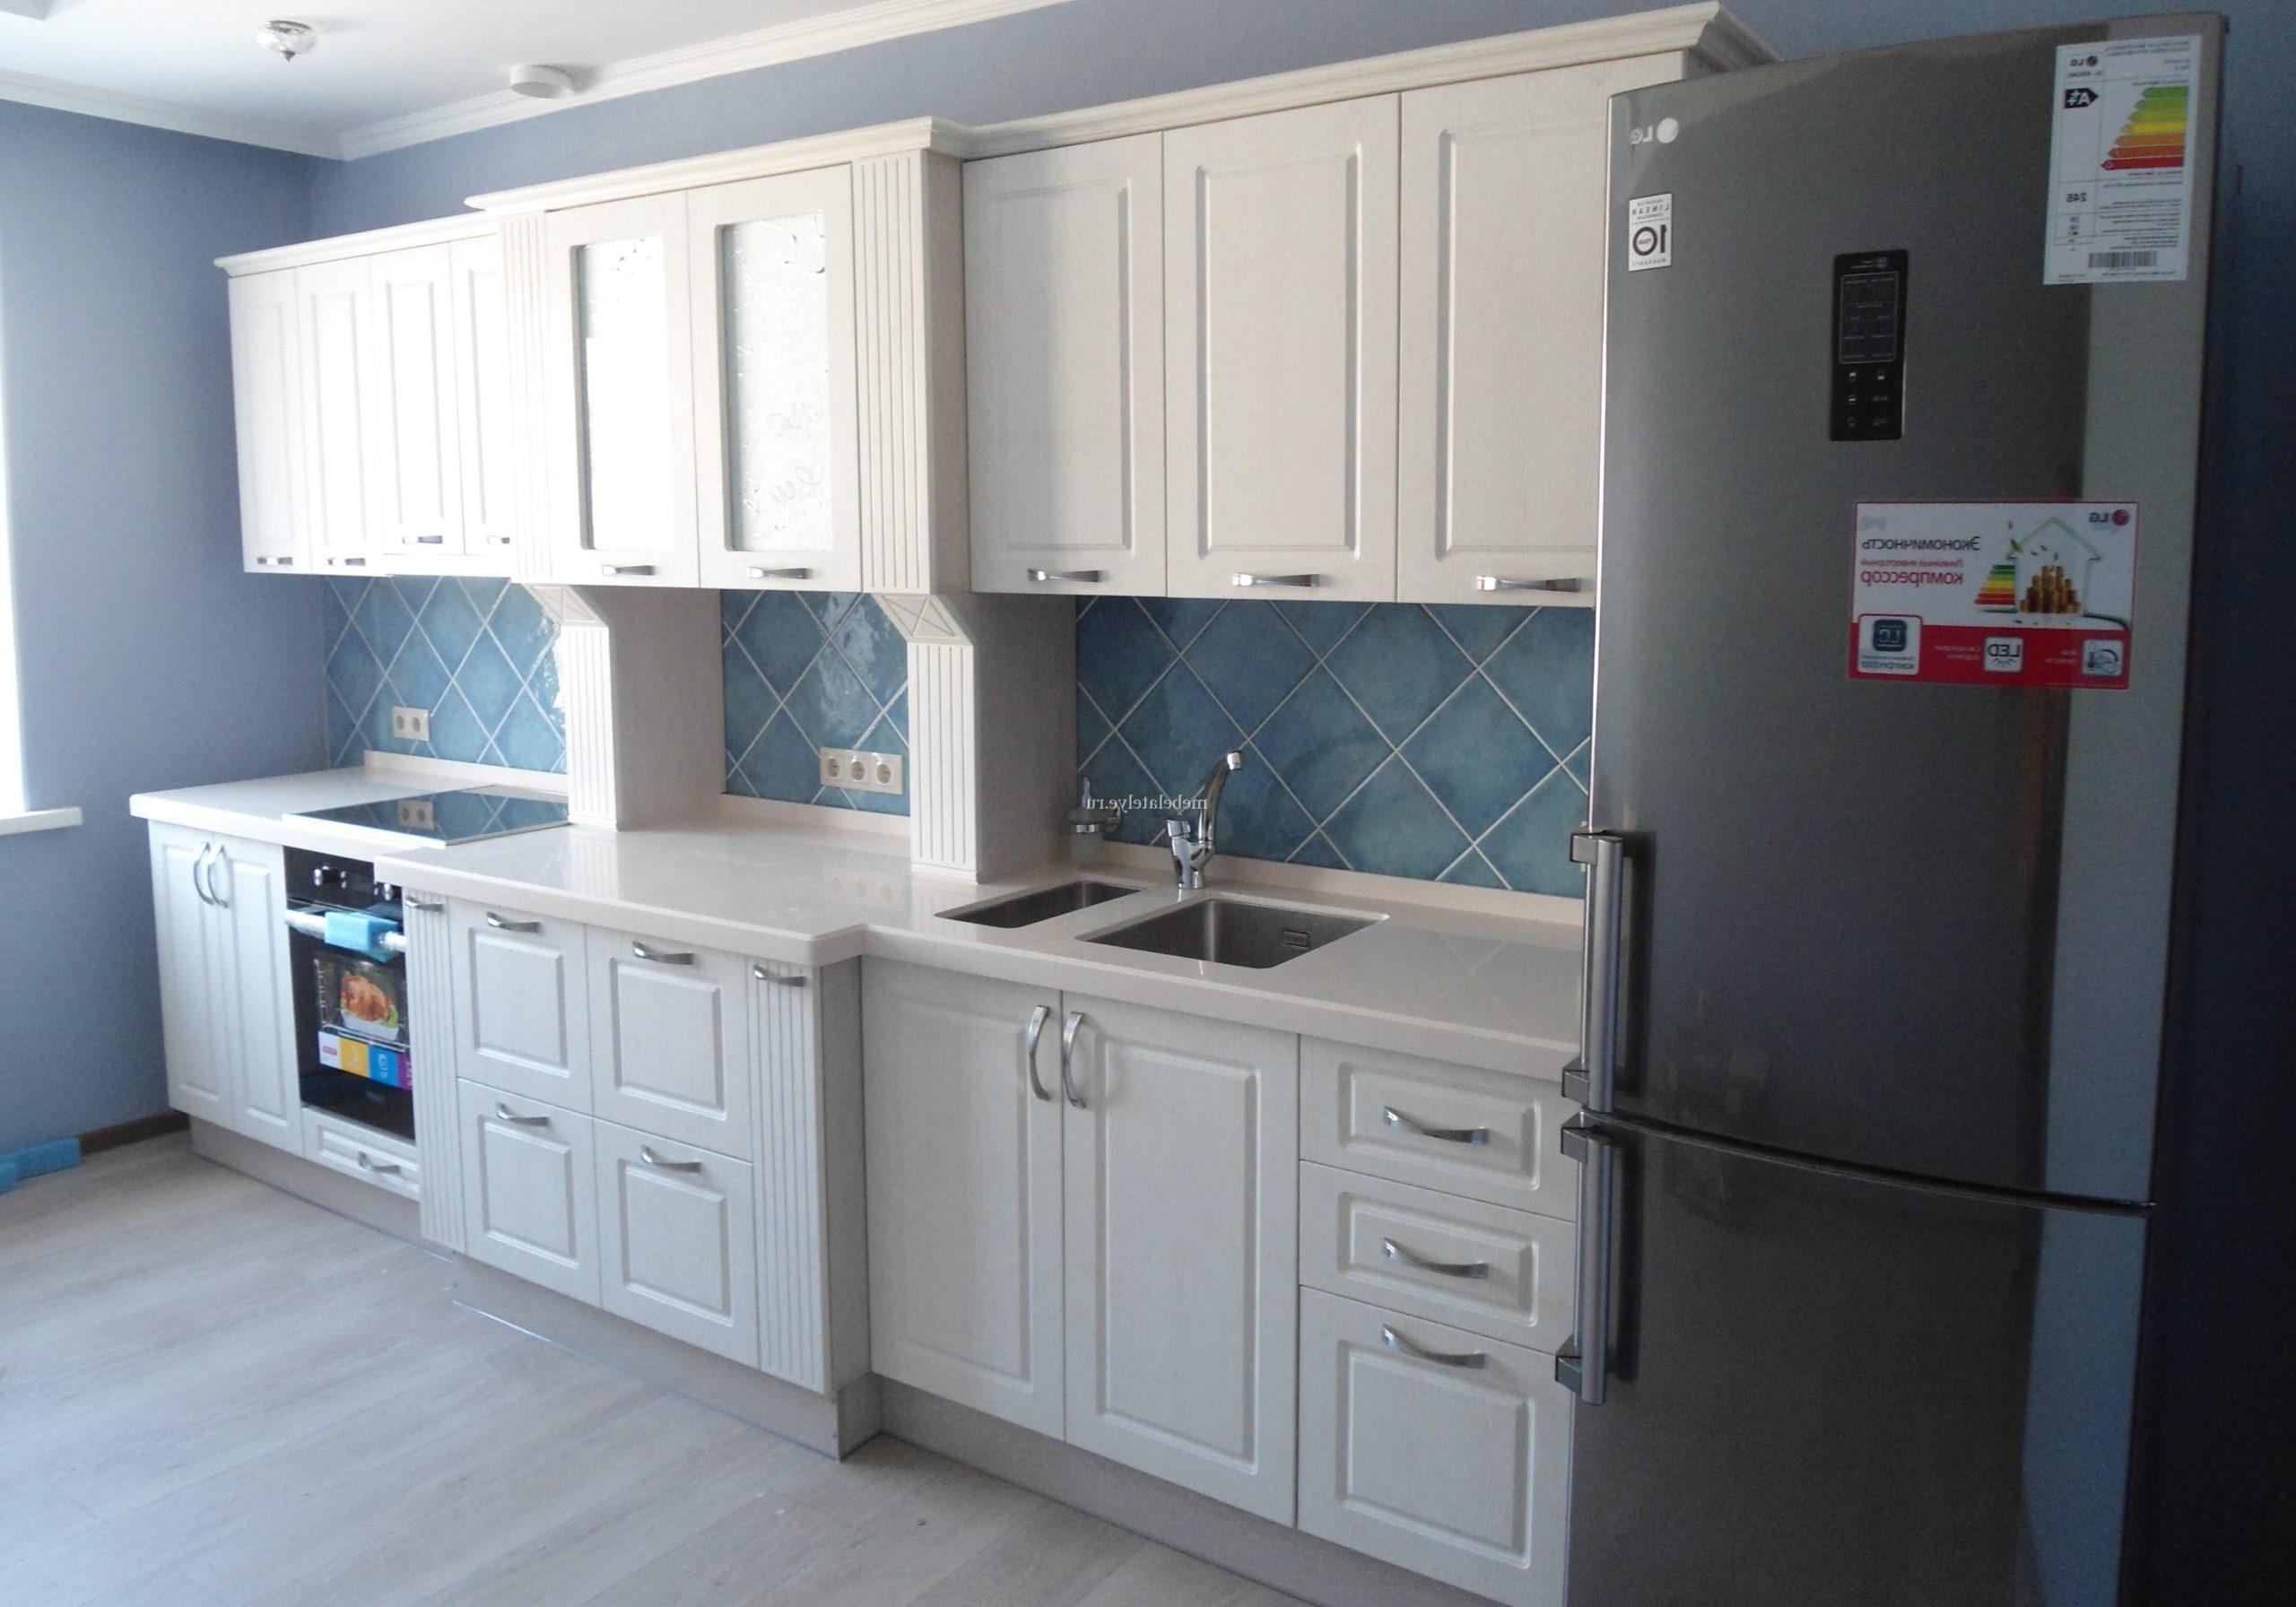 Прямая белая кухня модерн, матовая, фрезерованные фасады МДФ